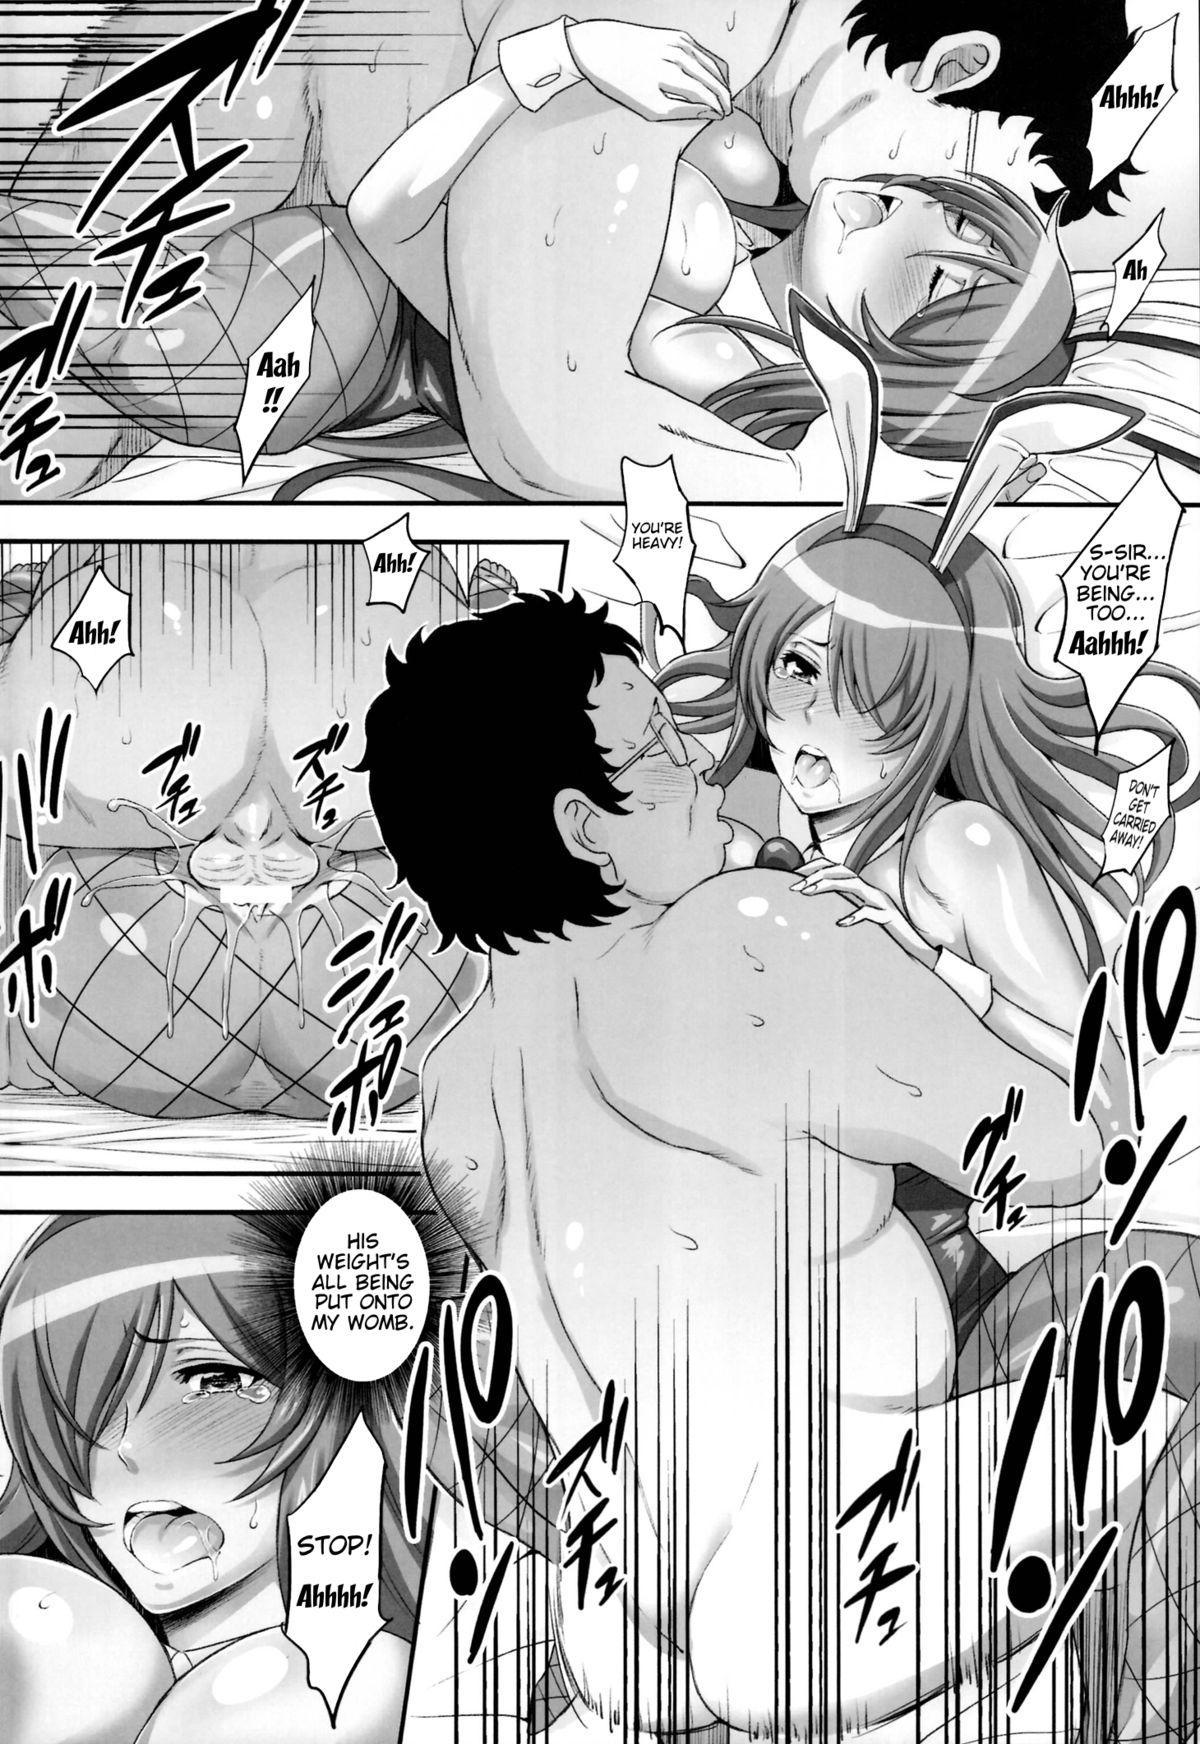 (C86) [Diogenes Club (Haikawa Hemlen)] Shokukan Mankan Zenseki Go Touki Ryoujoku   Shokukan Mankan Zenseki 5 - Princess Rape Battle- Cosplay Kanu (Ikkitousen) [English] {doujin-moe.us} 14